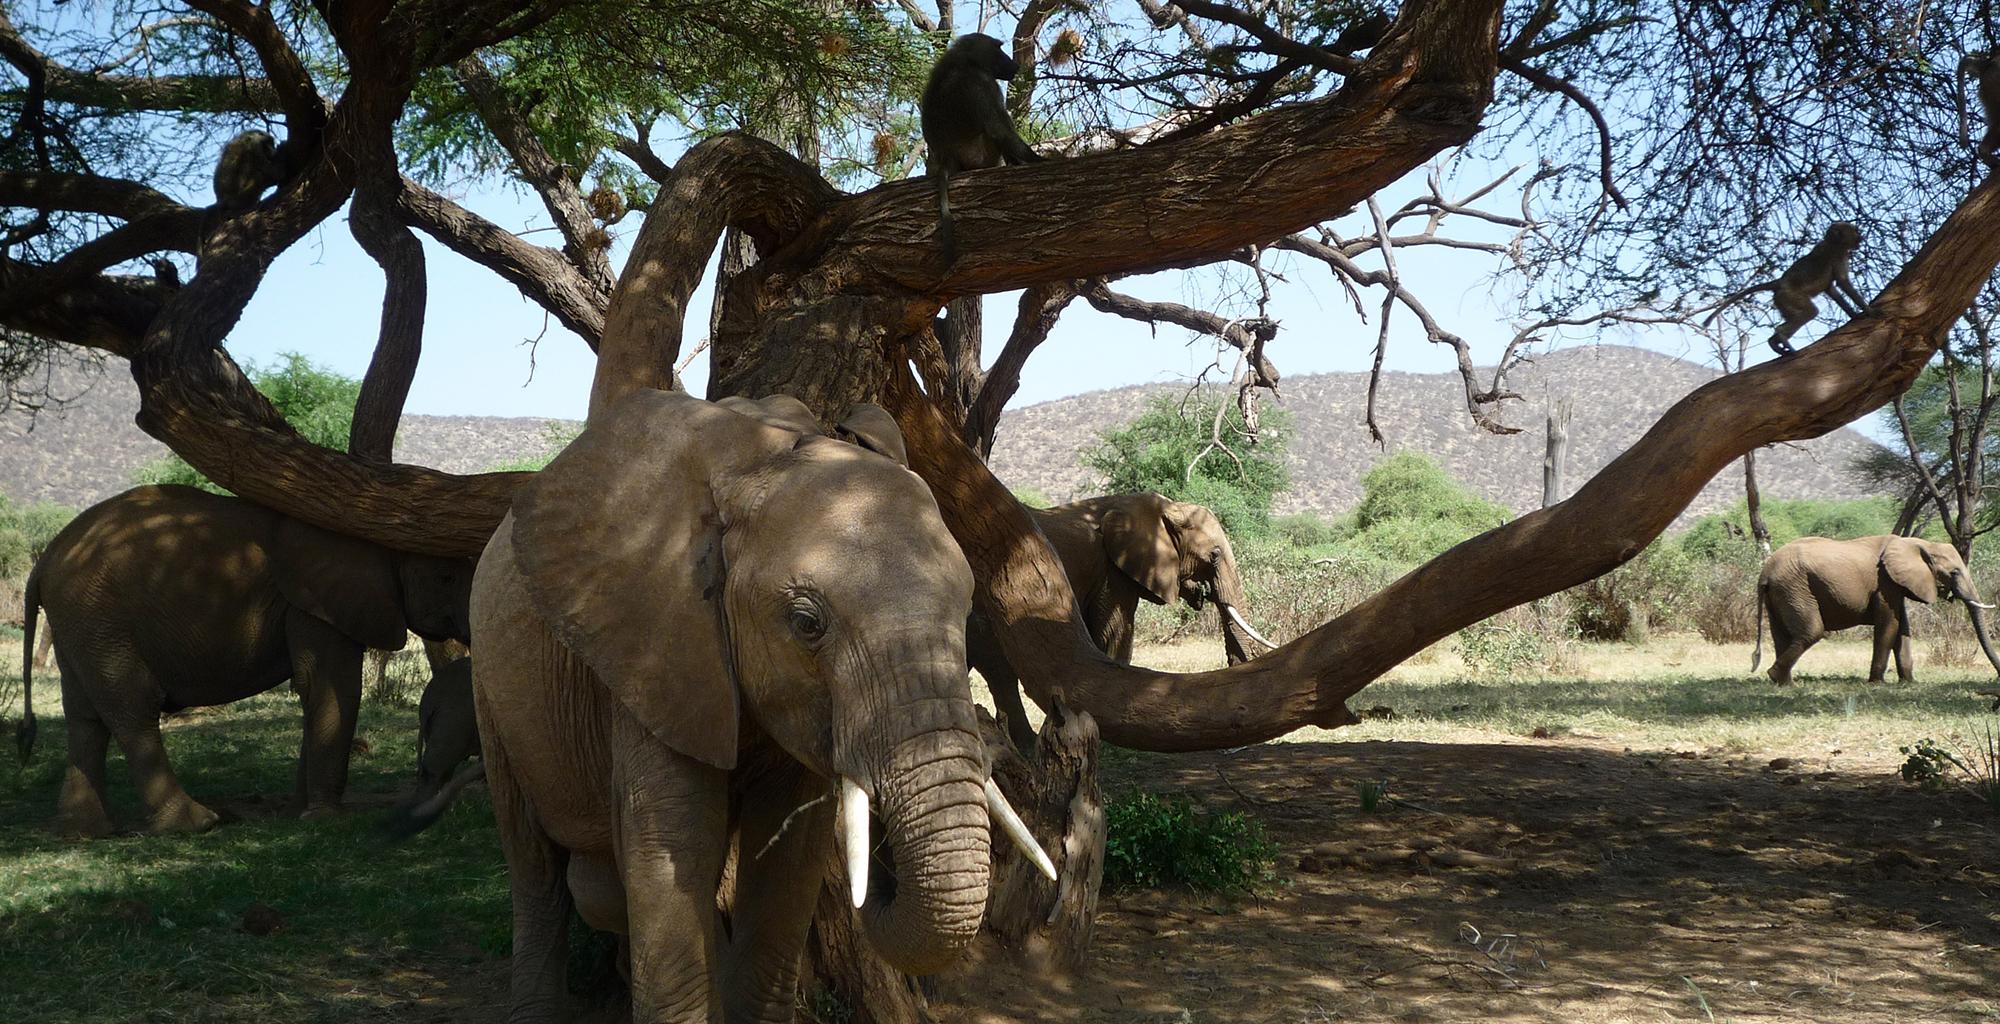 Kenya-Elephant-Watch-Elephant-Monkey-Tree